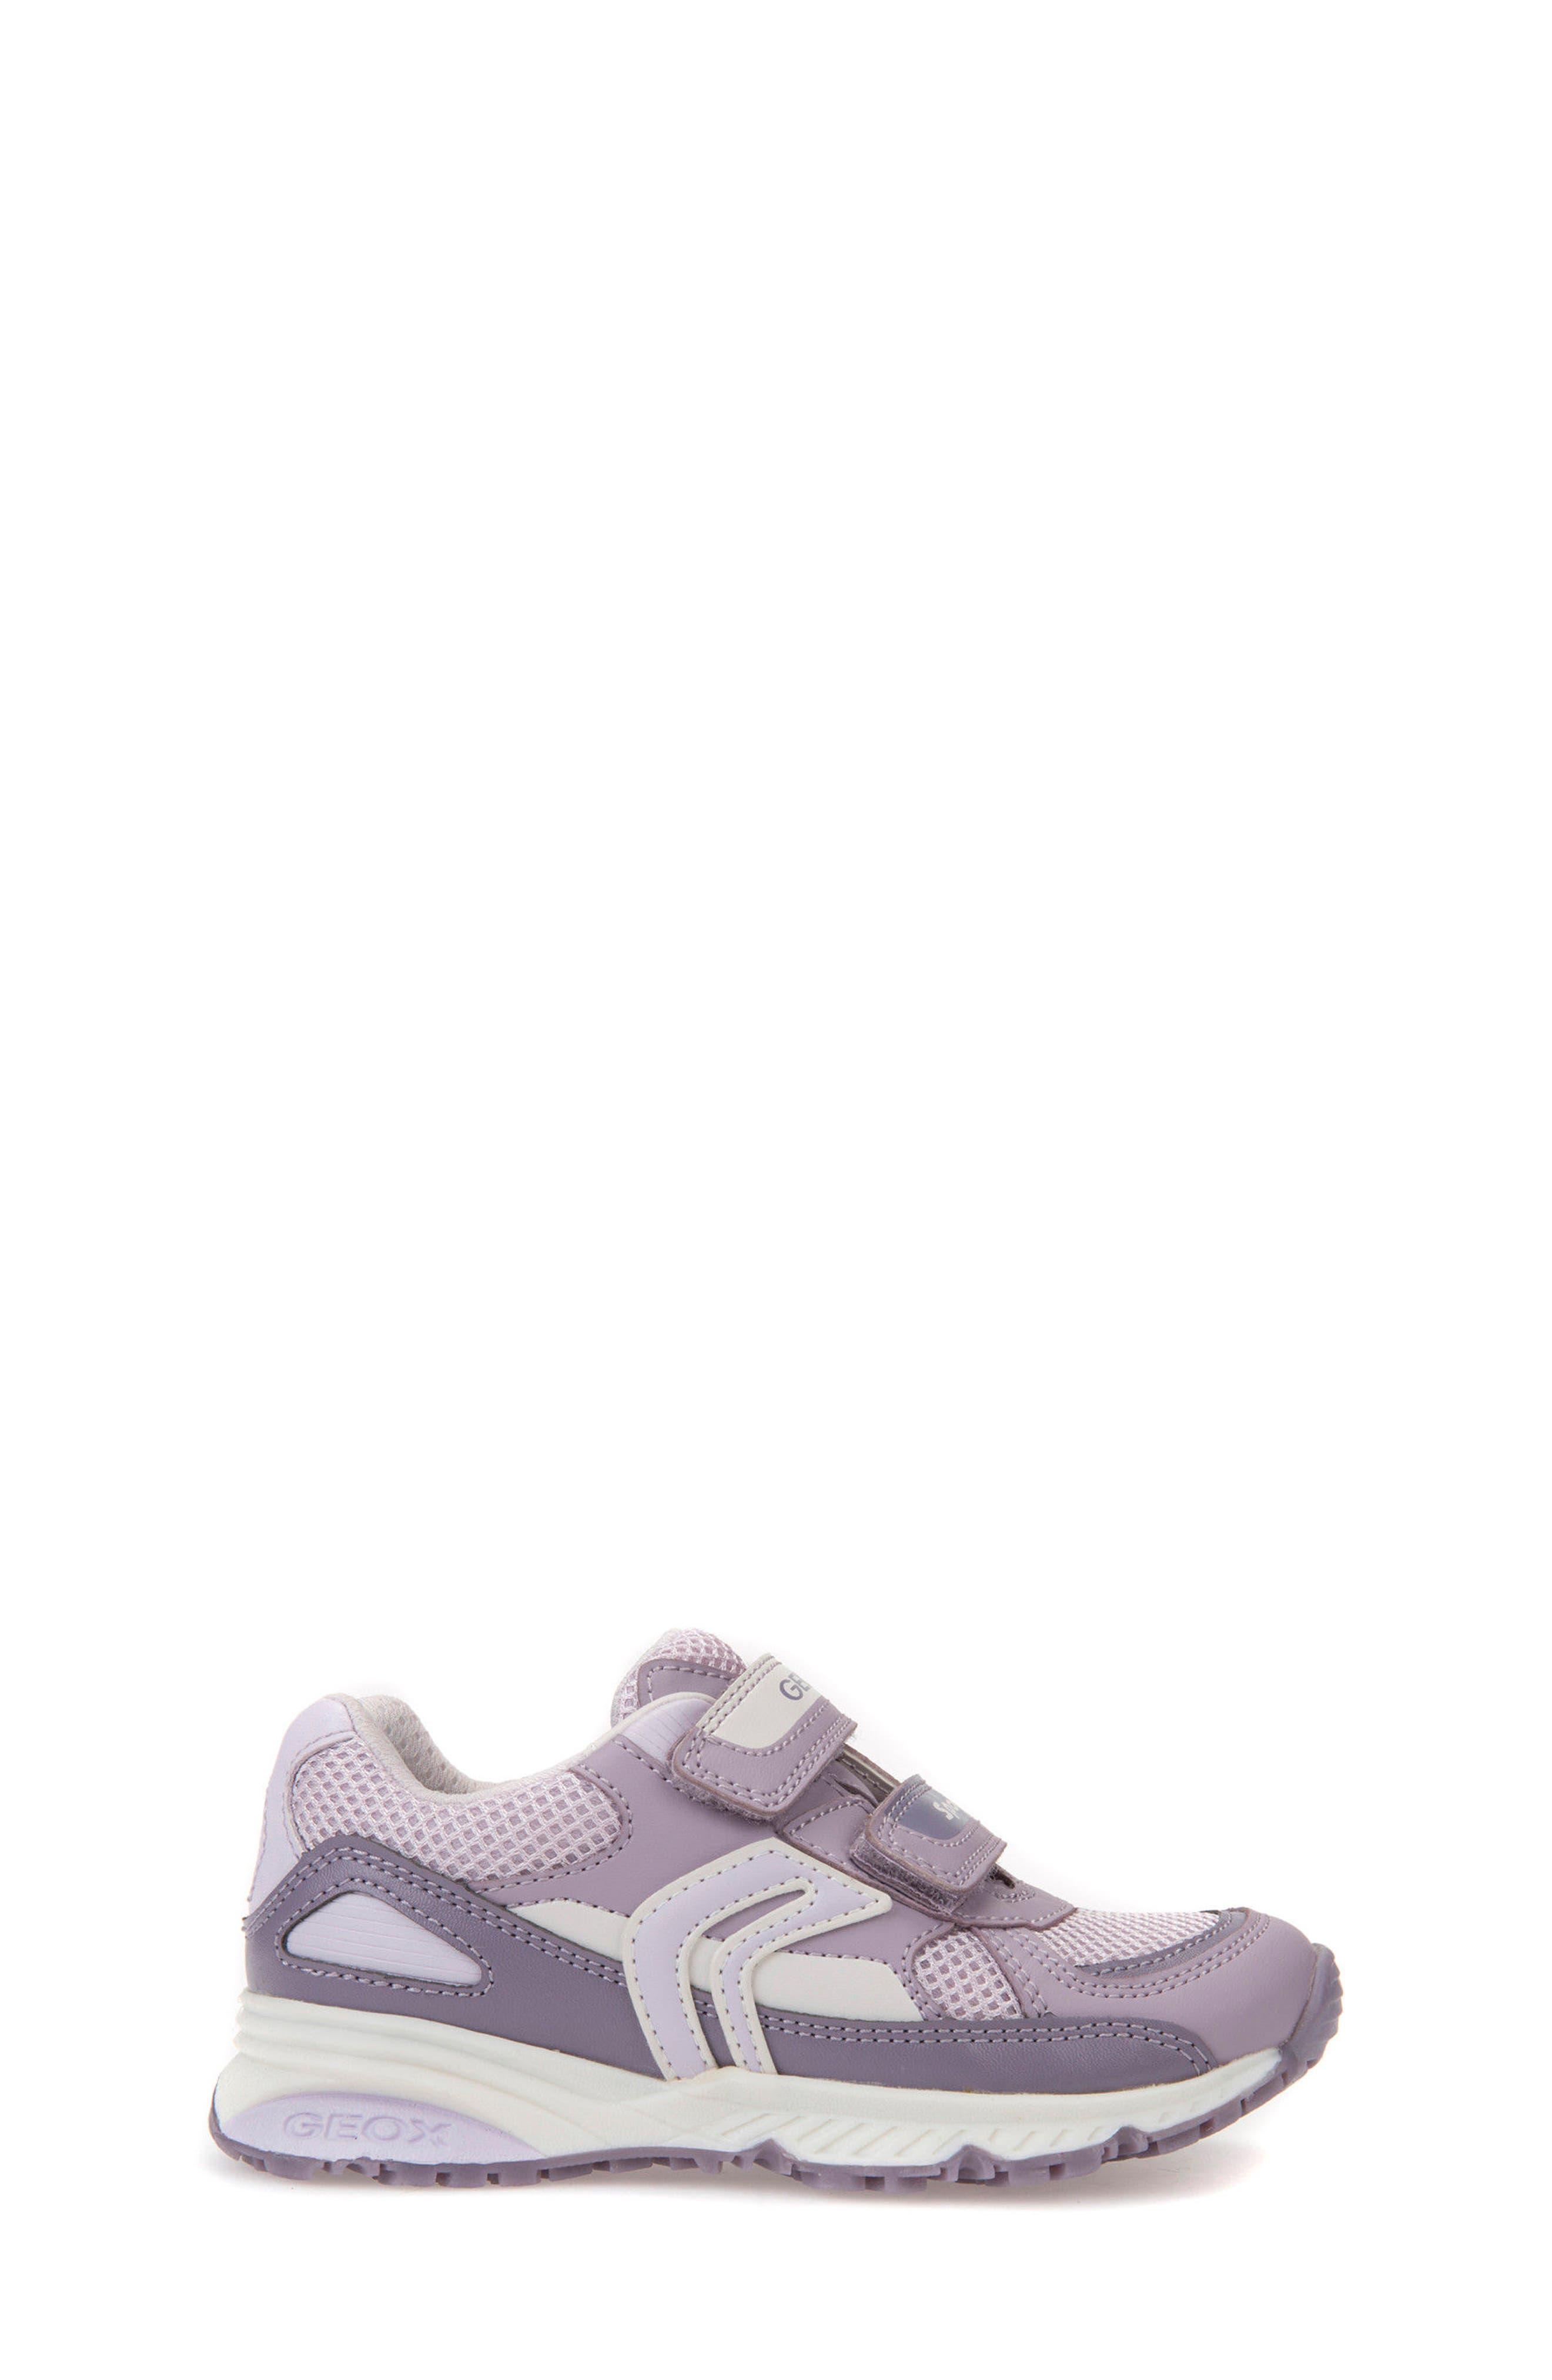 Bernie Sneaker,                             Alternate thumbnail 3, color,                             Rose Smoke/ Light Lilac